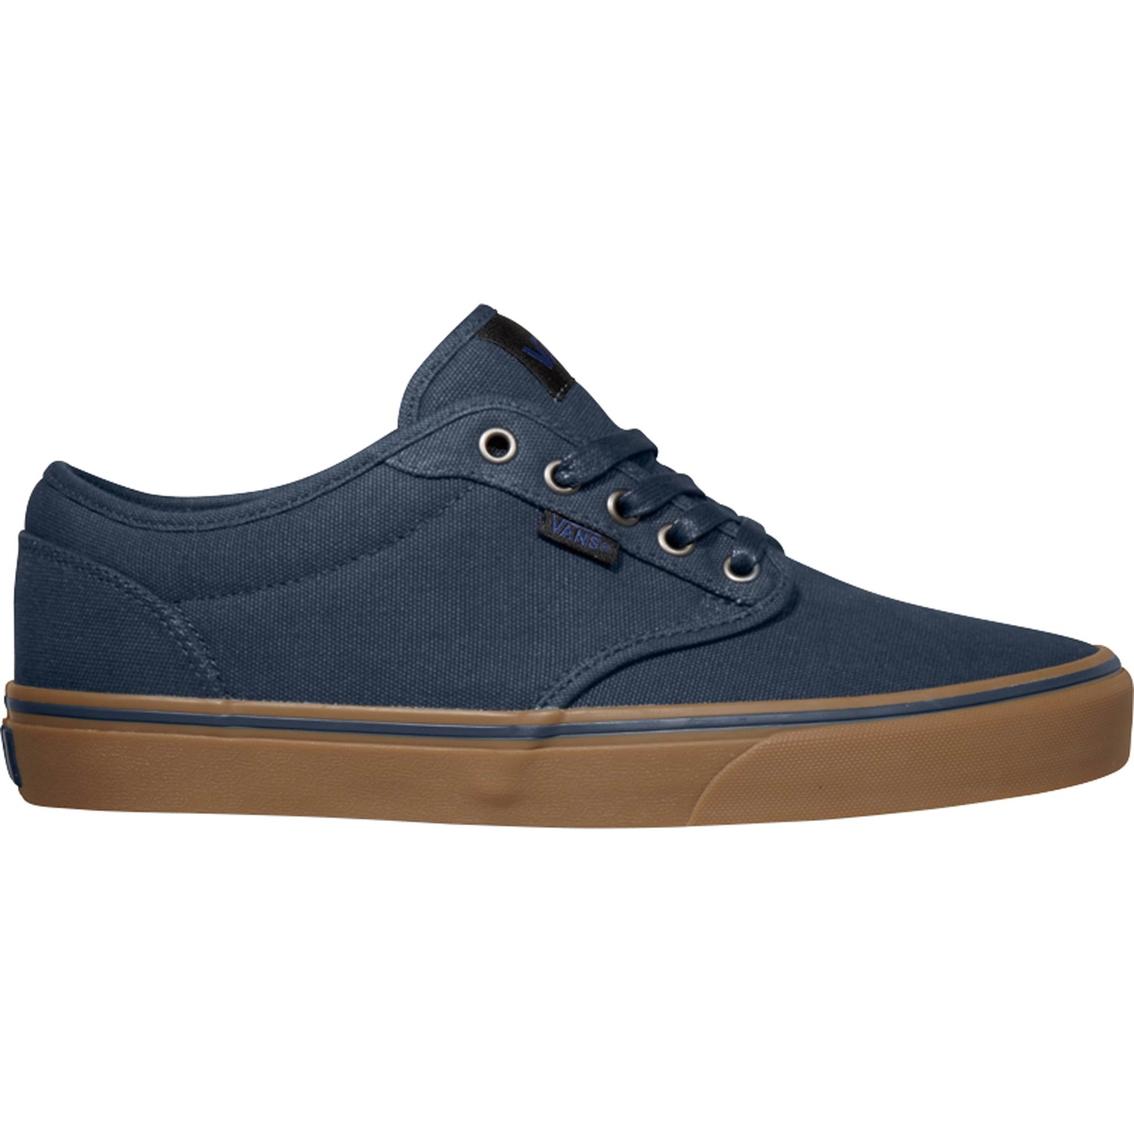 d001e2dccbd8b Vans Men's Atwood Canvas Shoes | Casuals | Back To School Shop ...